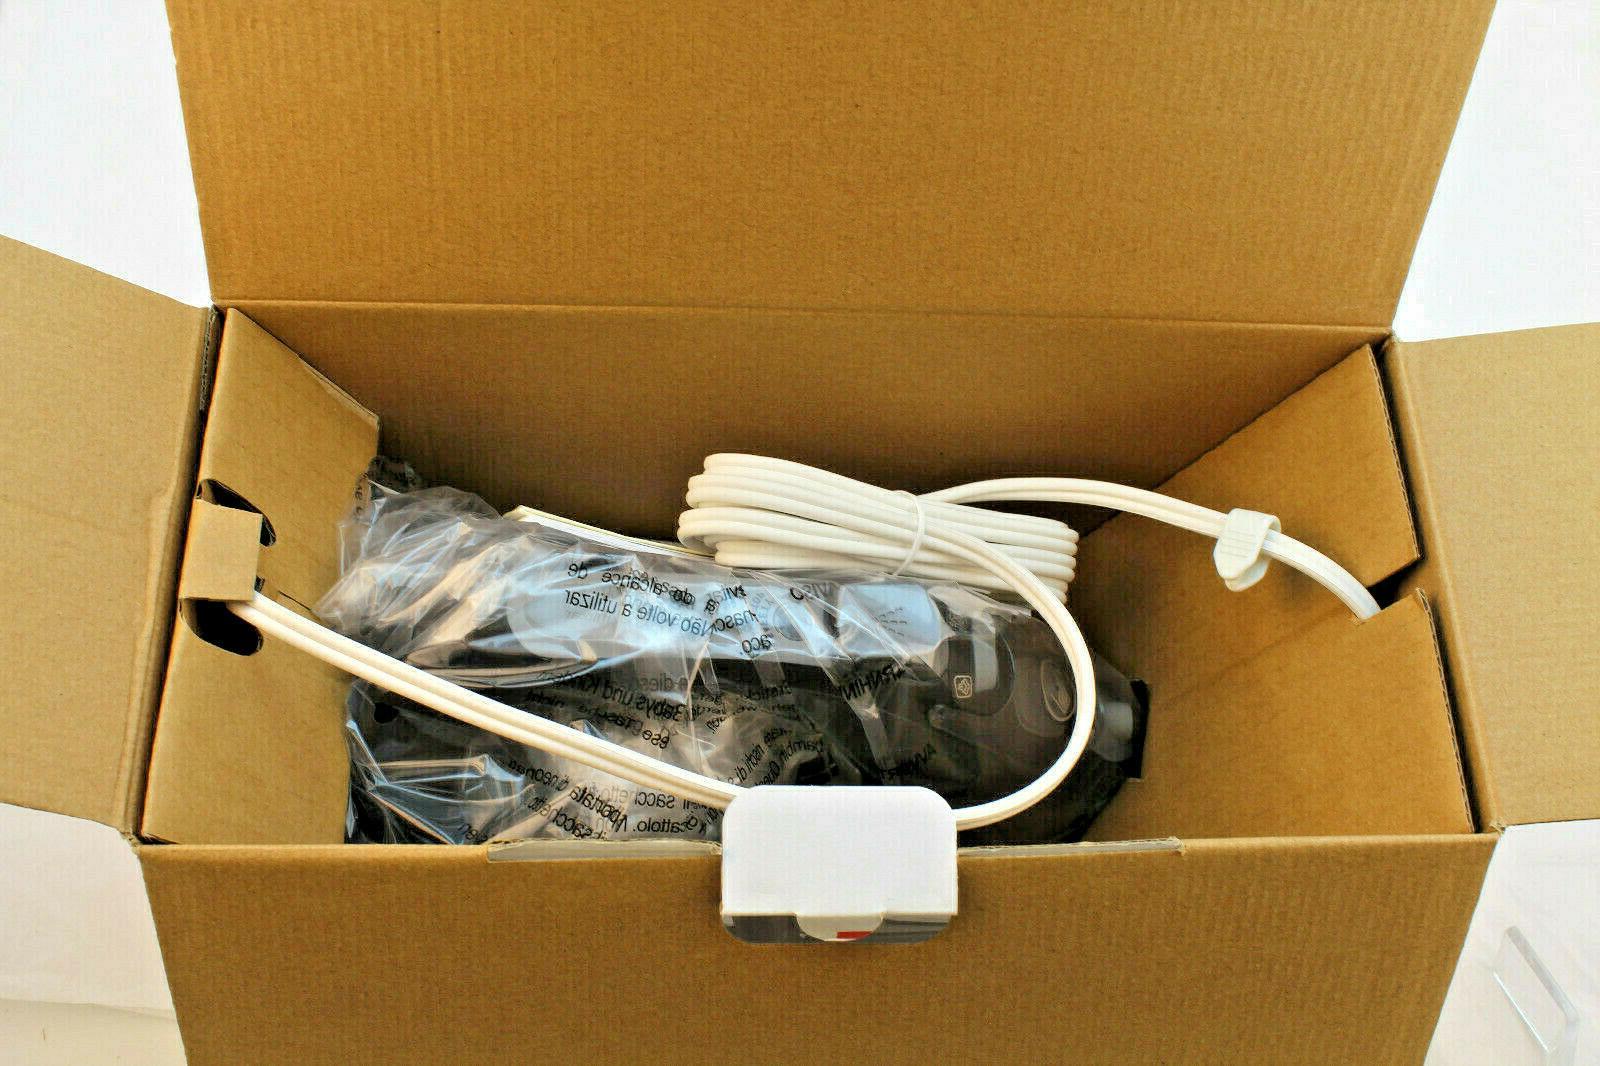 T-FAL FV2640U0 Powerglide Anticalc RETAIL $99